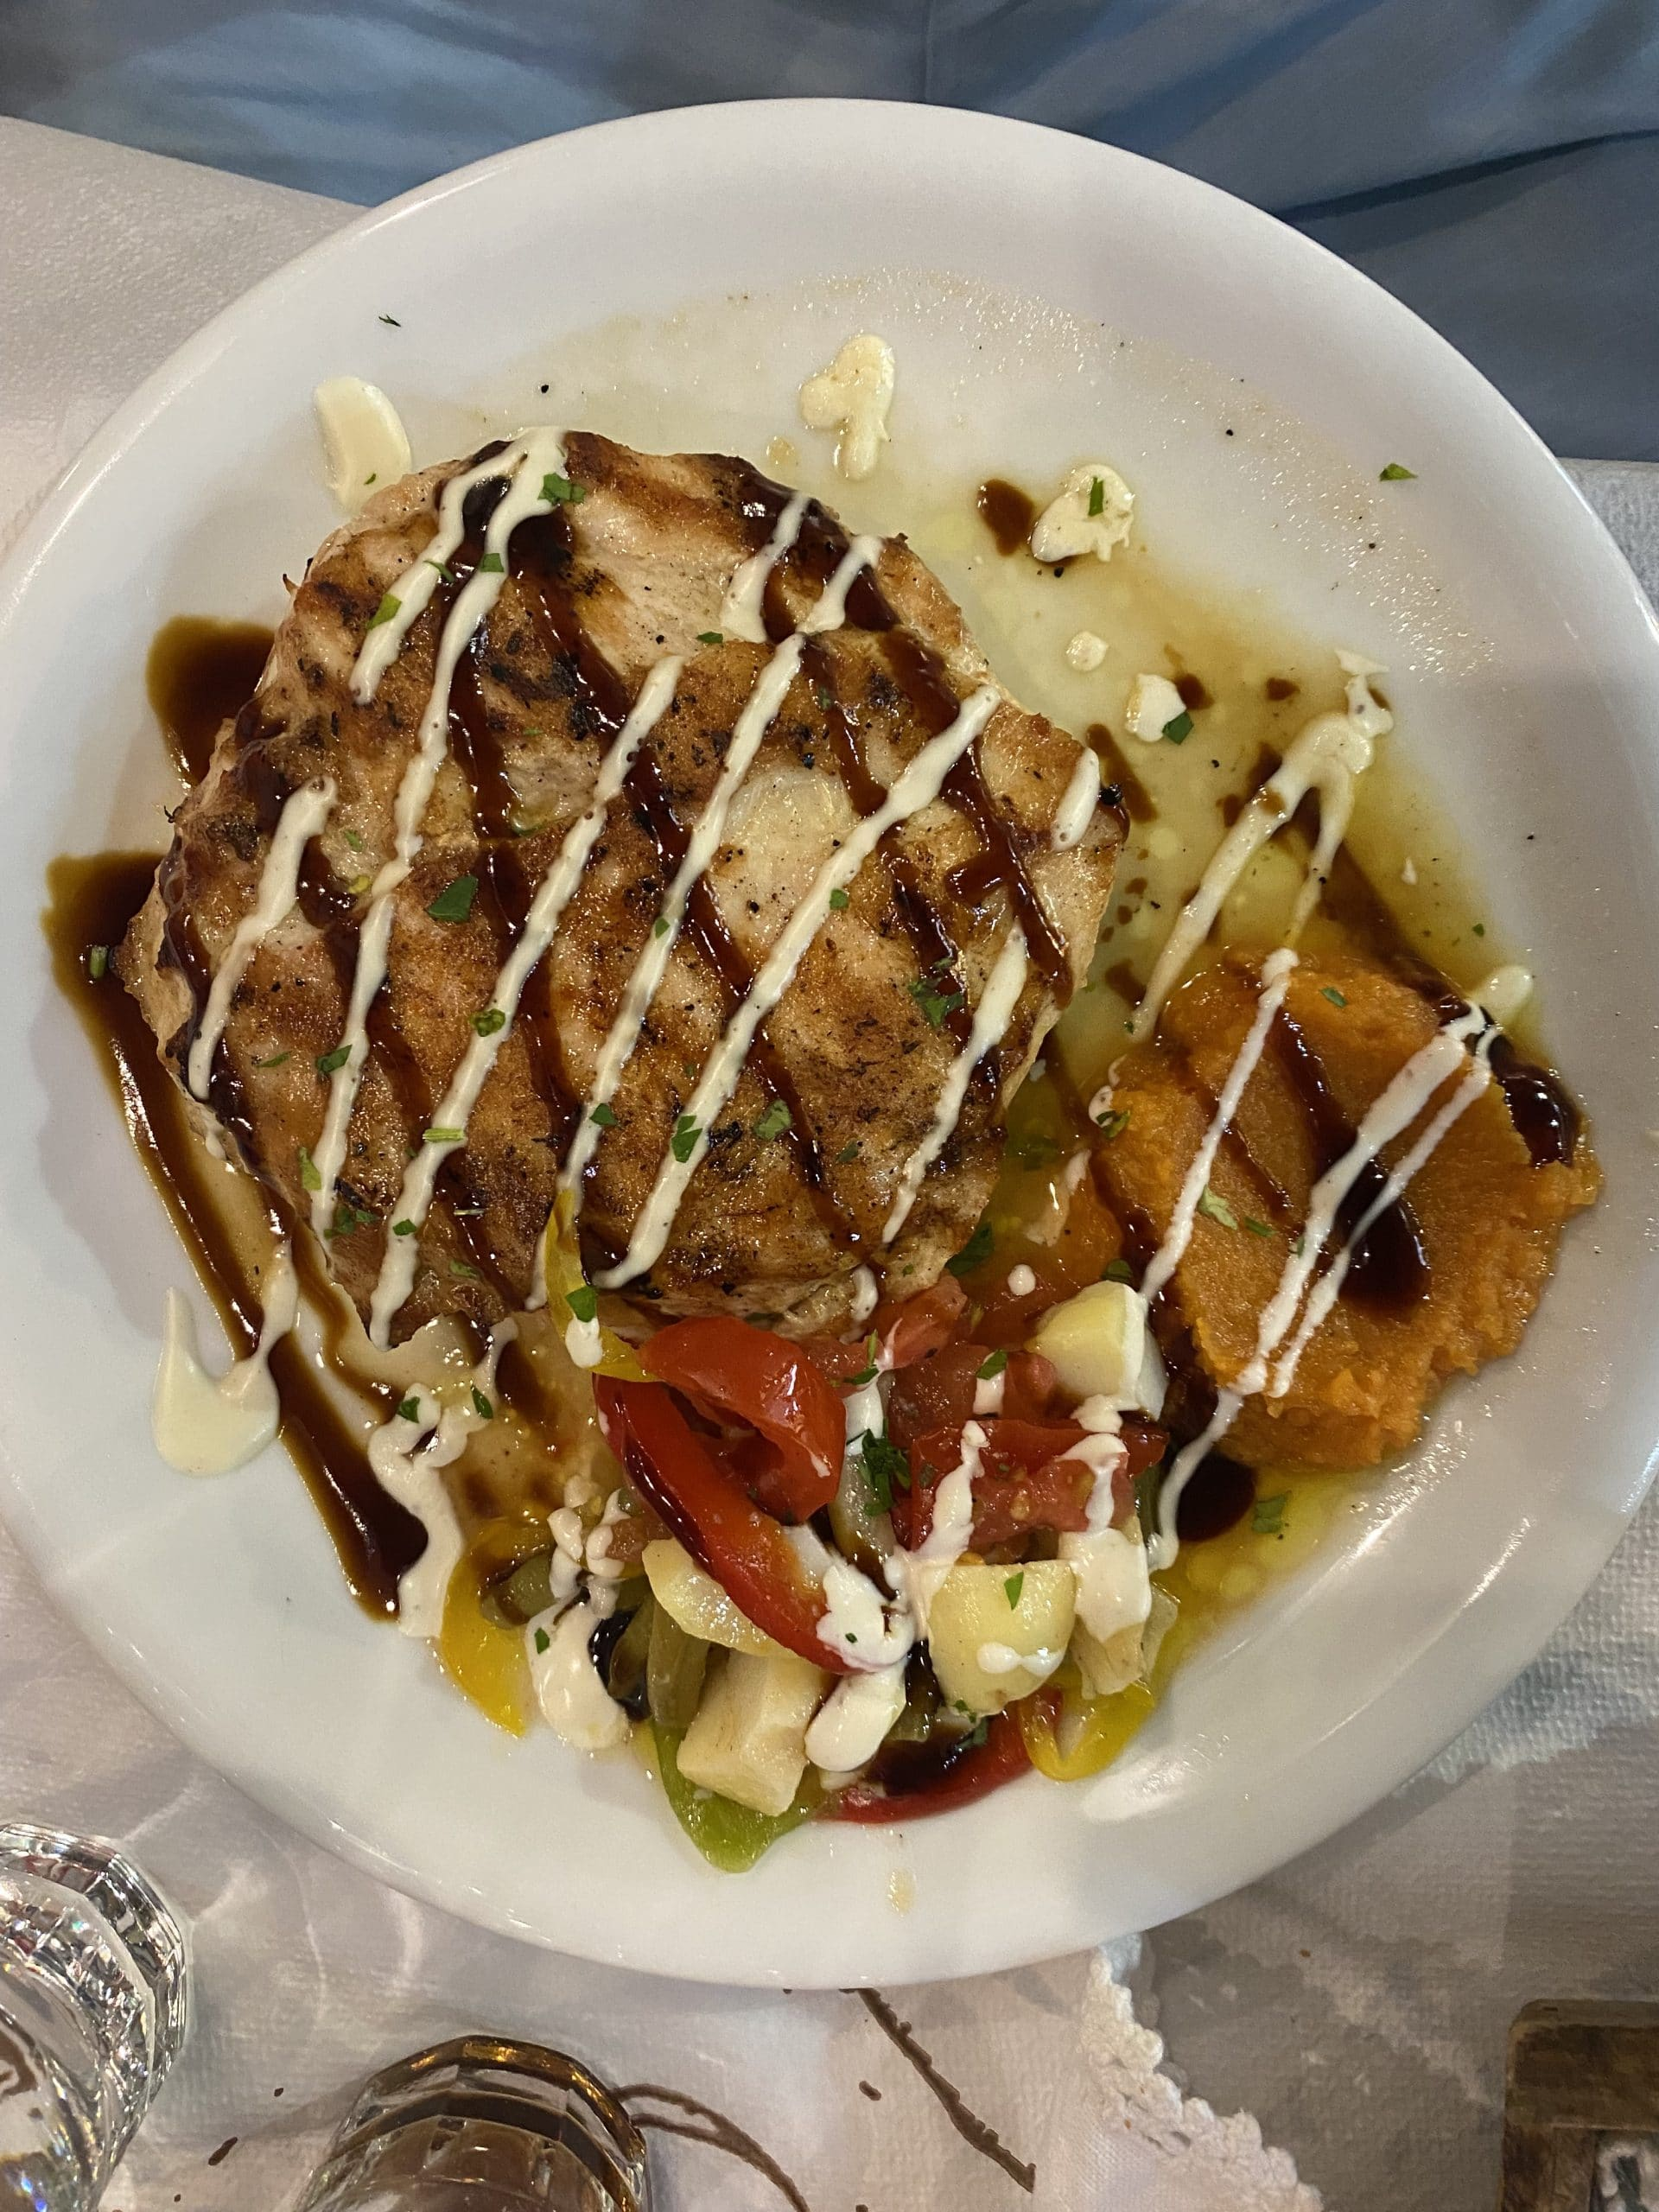 eric's chicken dish at archontoula milos